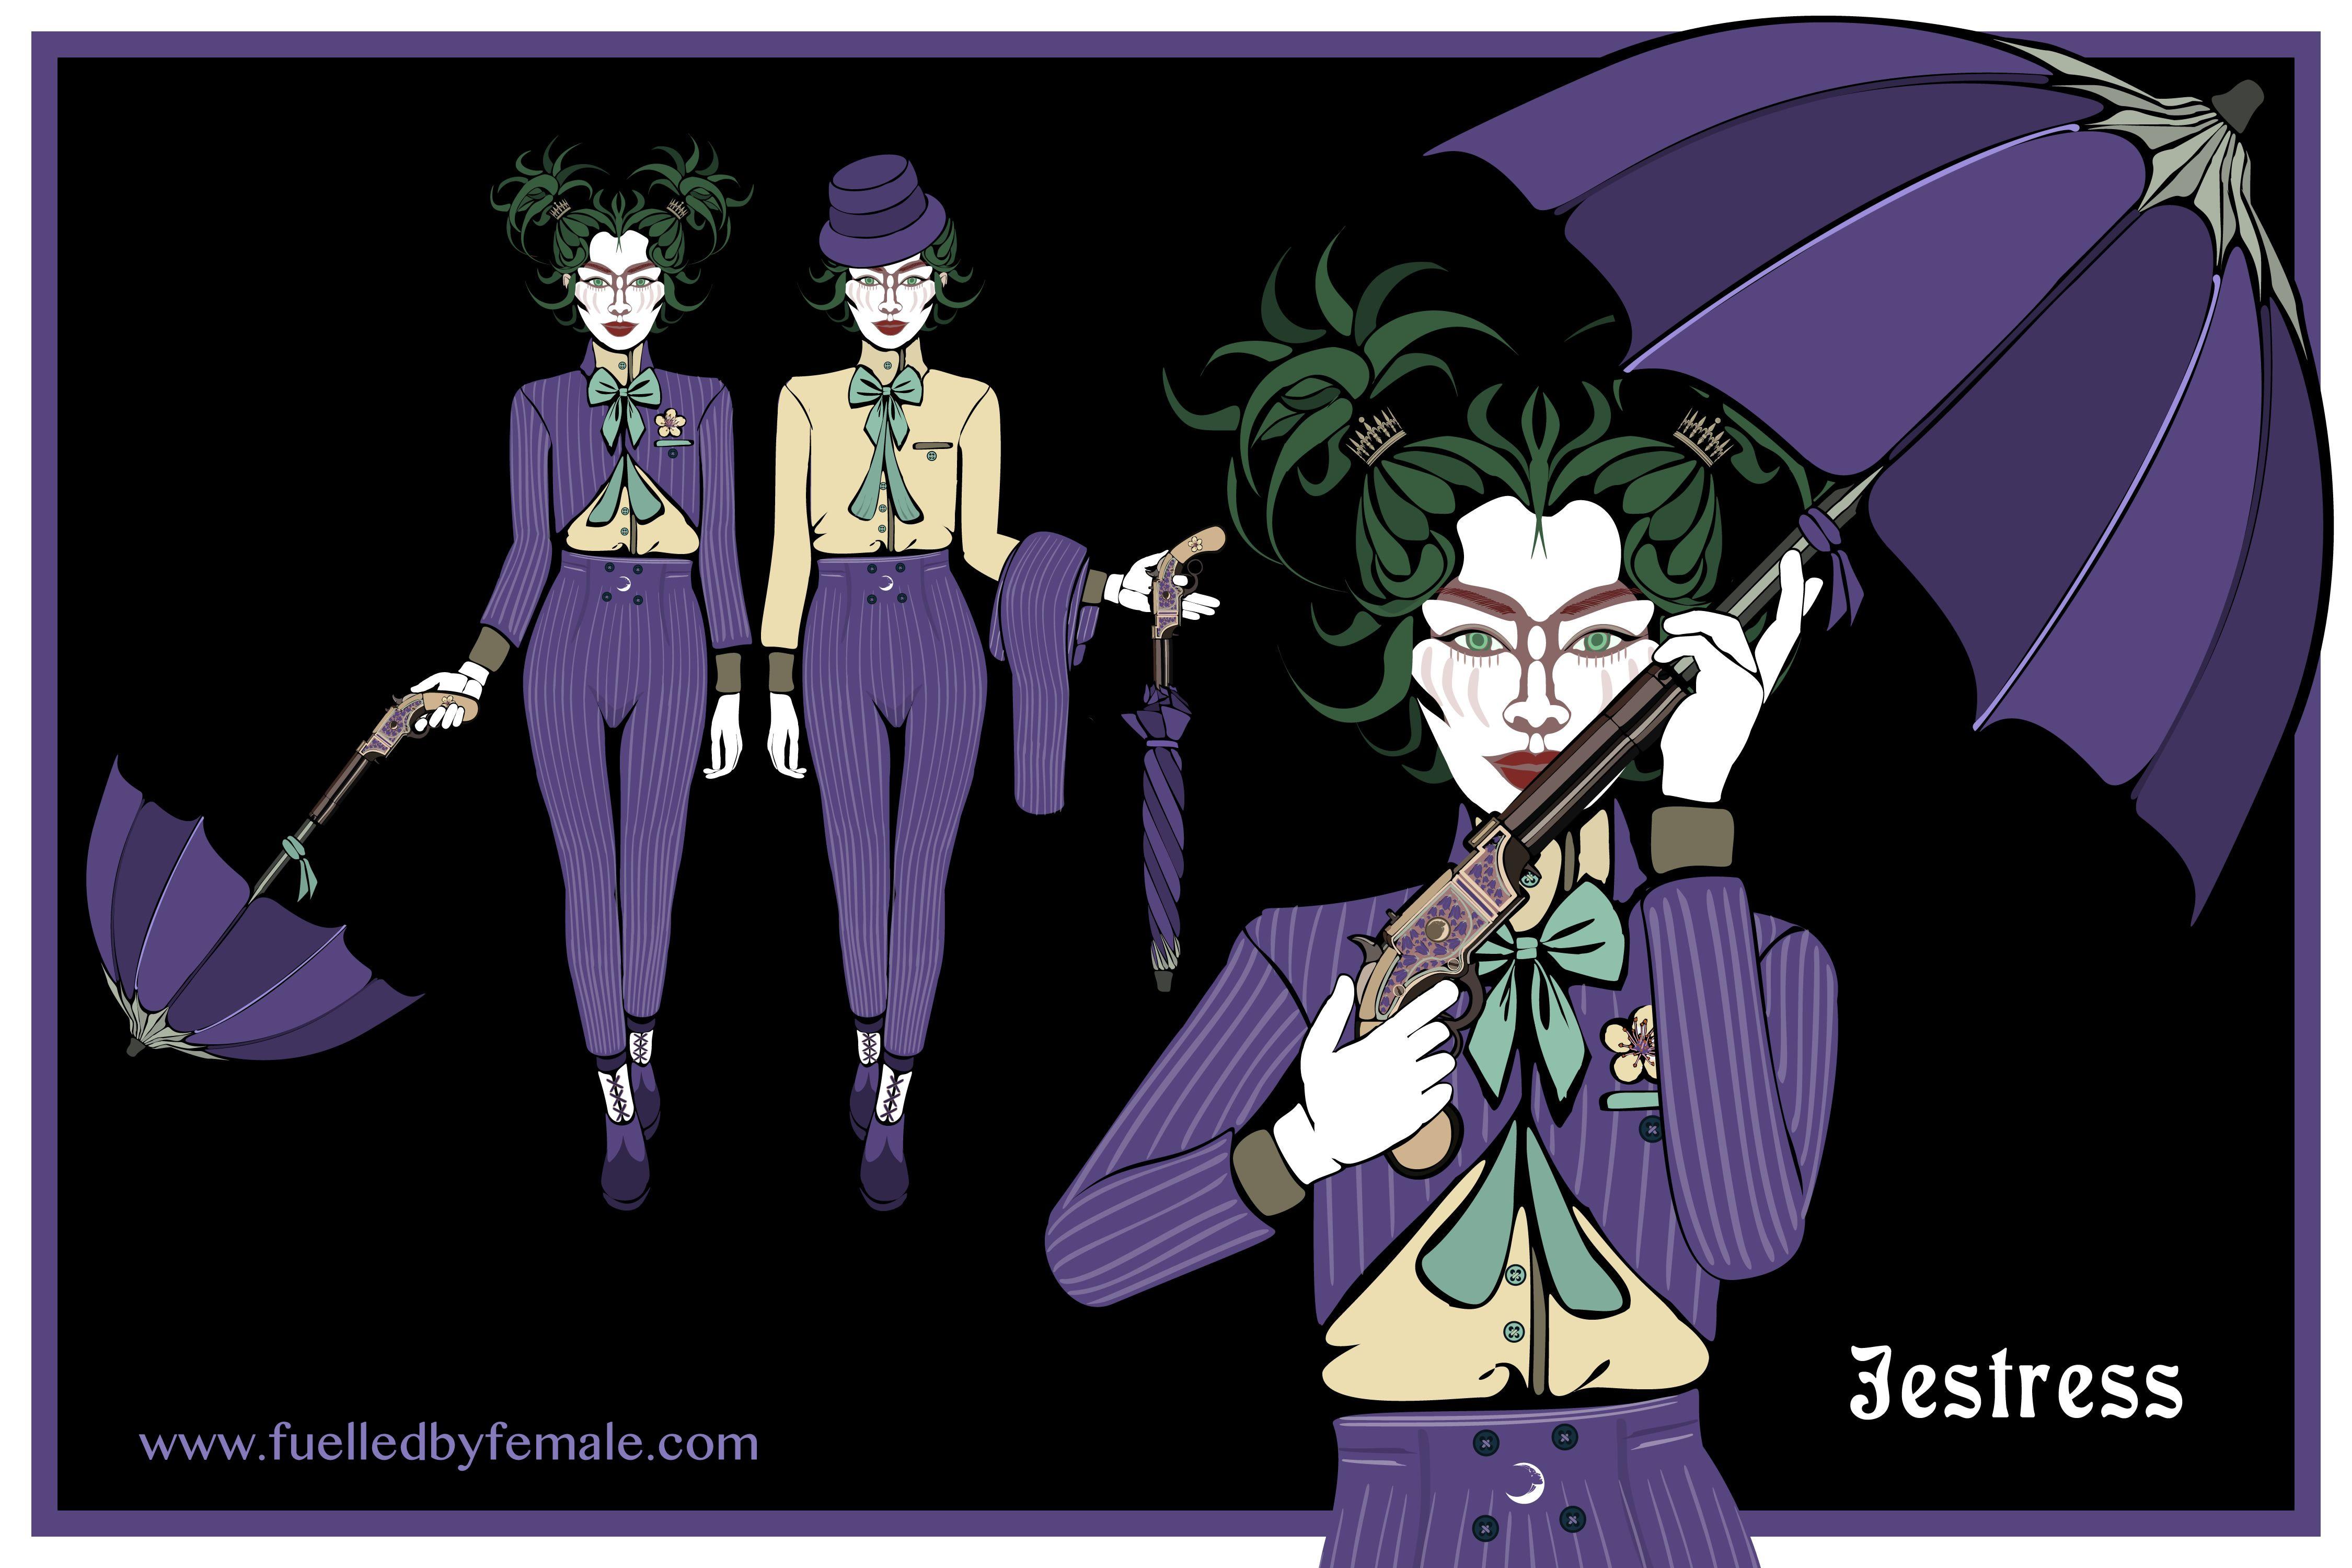 Jestress (with Victorian pistol handle umbrella) - Daniel Orlick fashion art #fuelledbyfemale